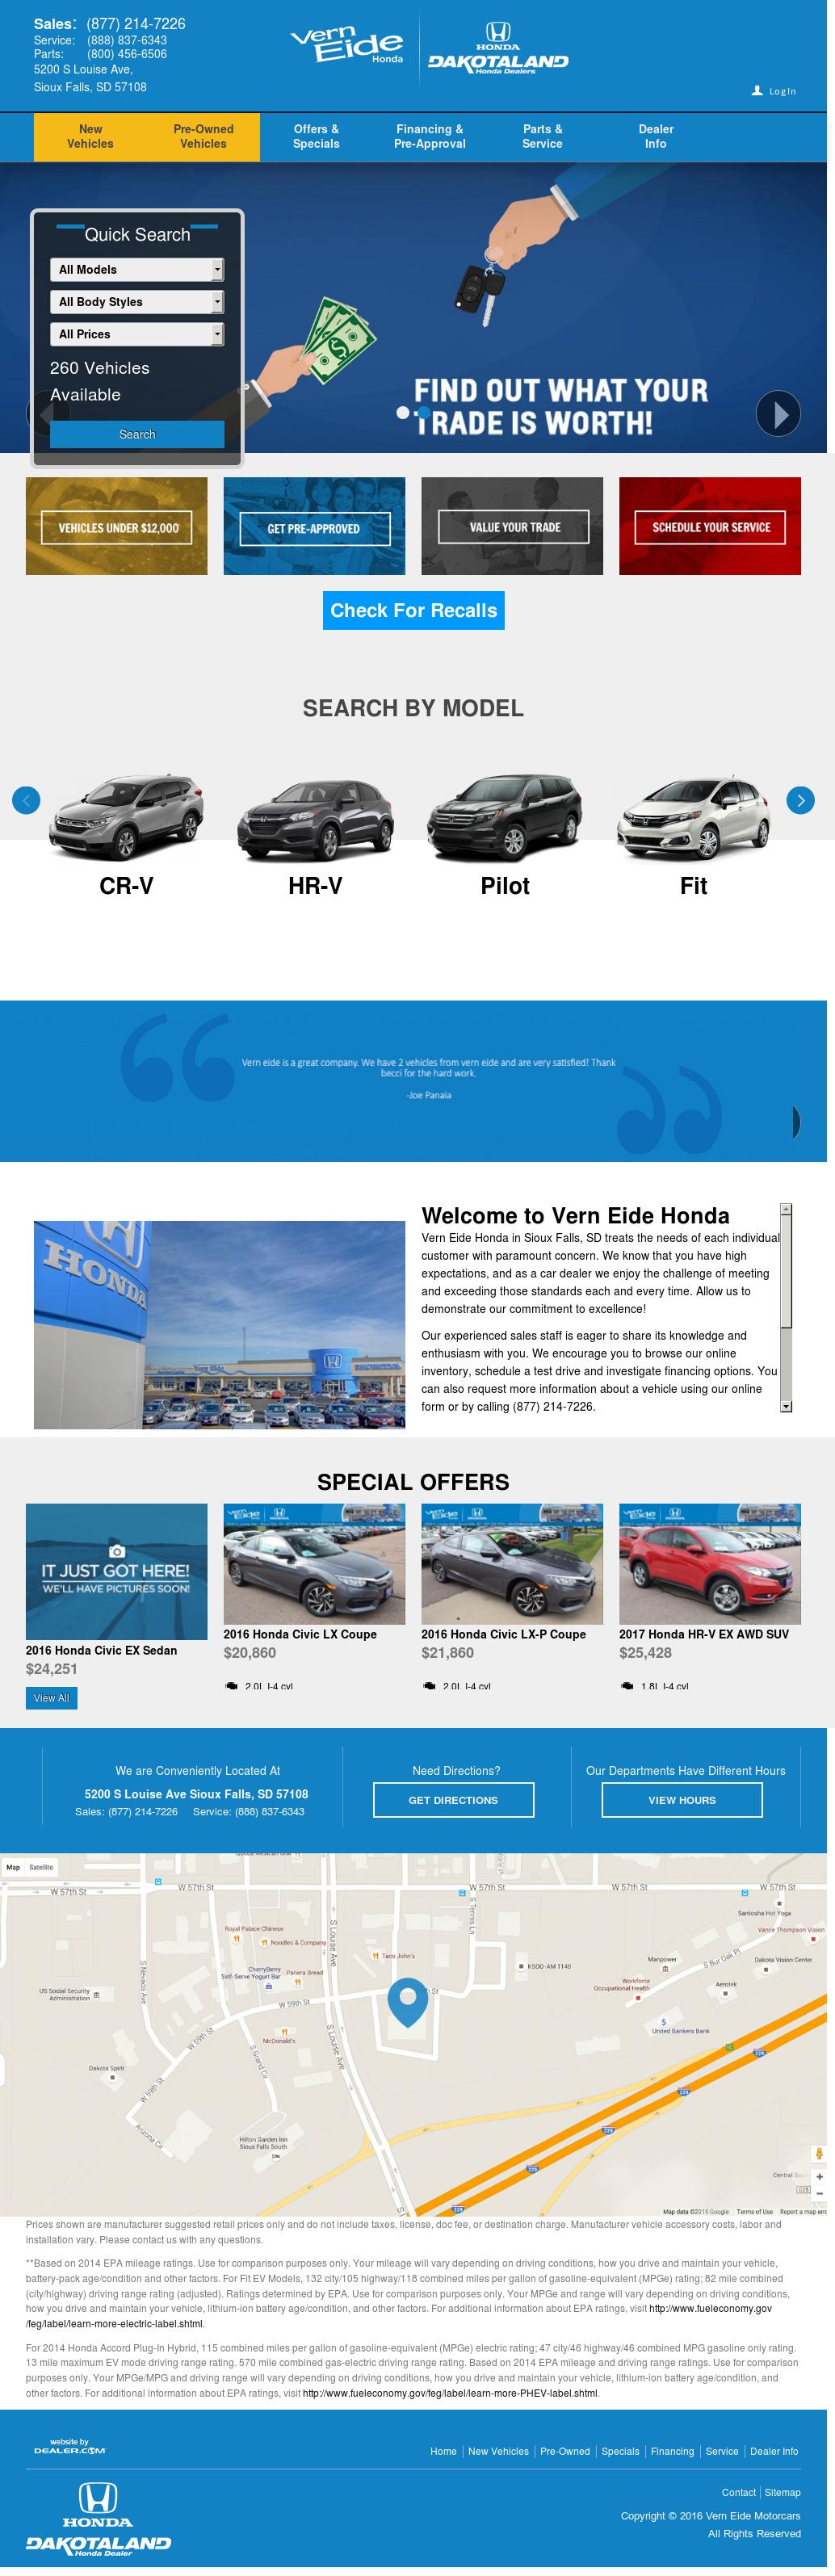 Vern Eide Honda Website History